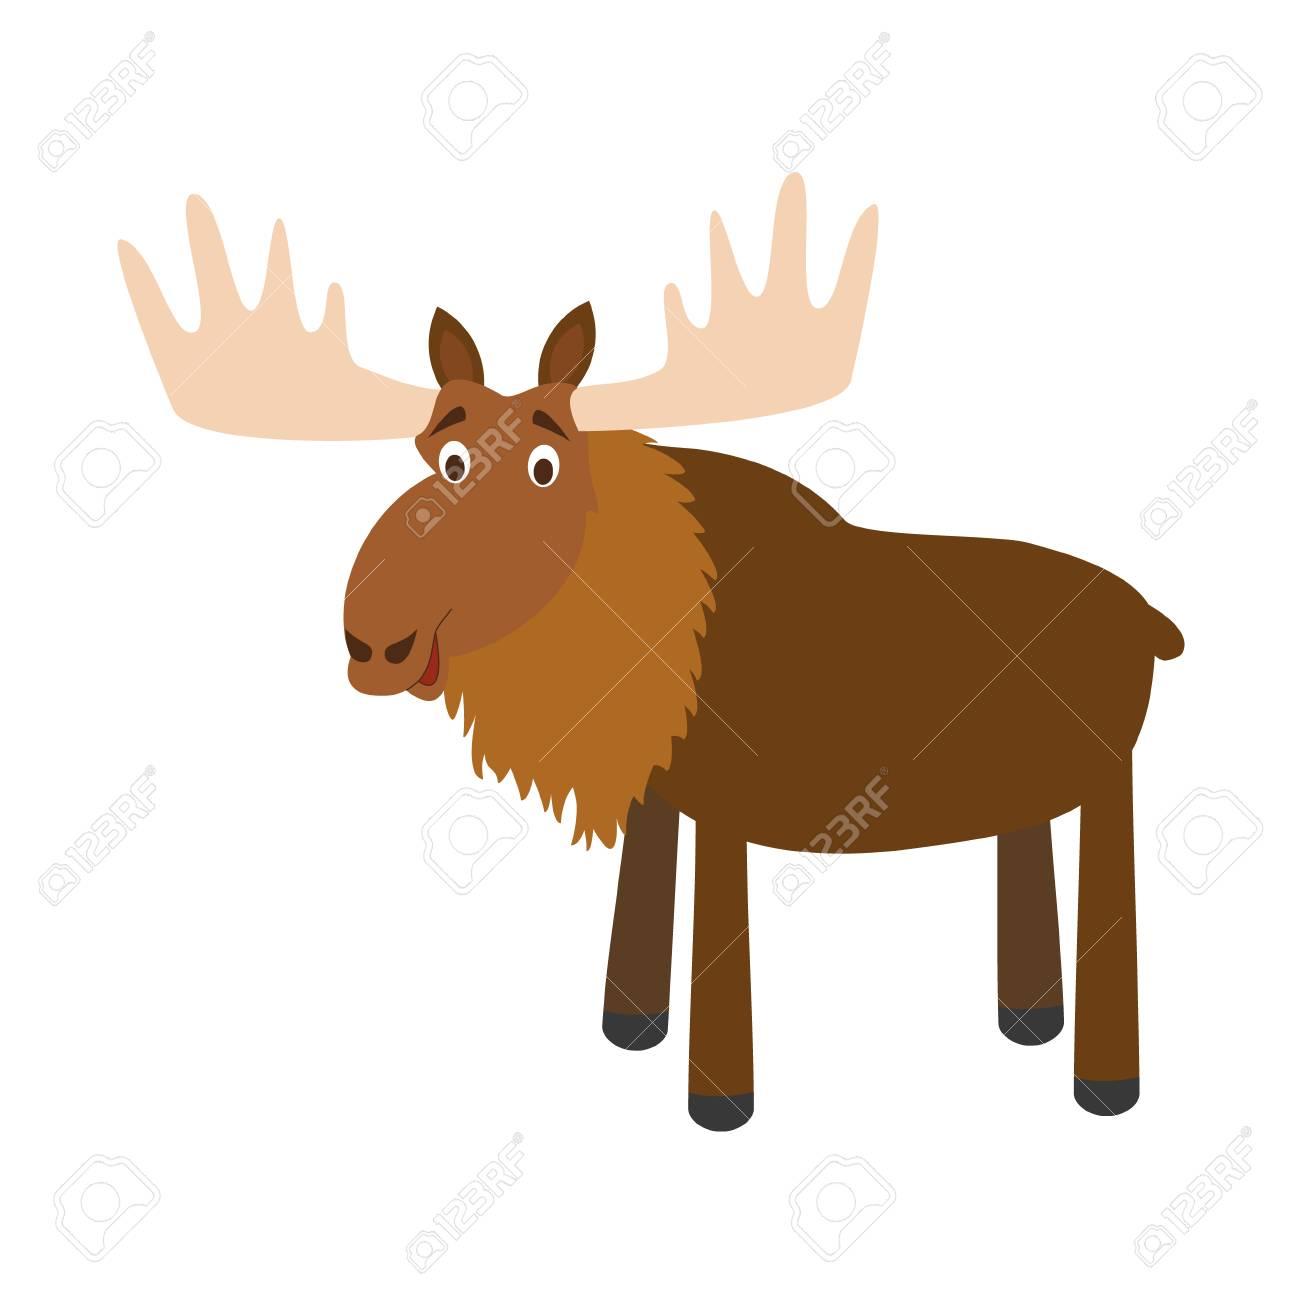 cute cartoon moose vector illustration royalty free cliparts rh 123rf com moose clip art silhouette mouse clipart